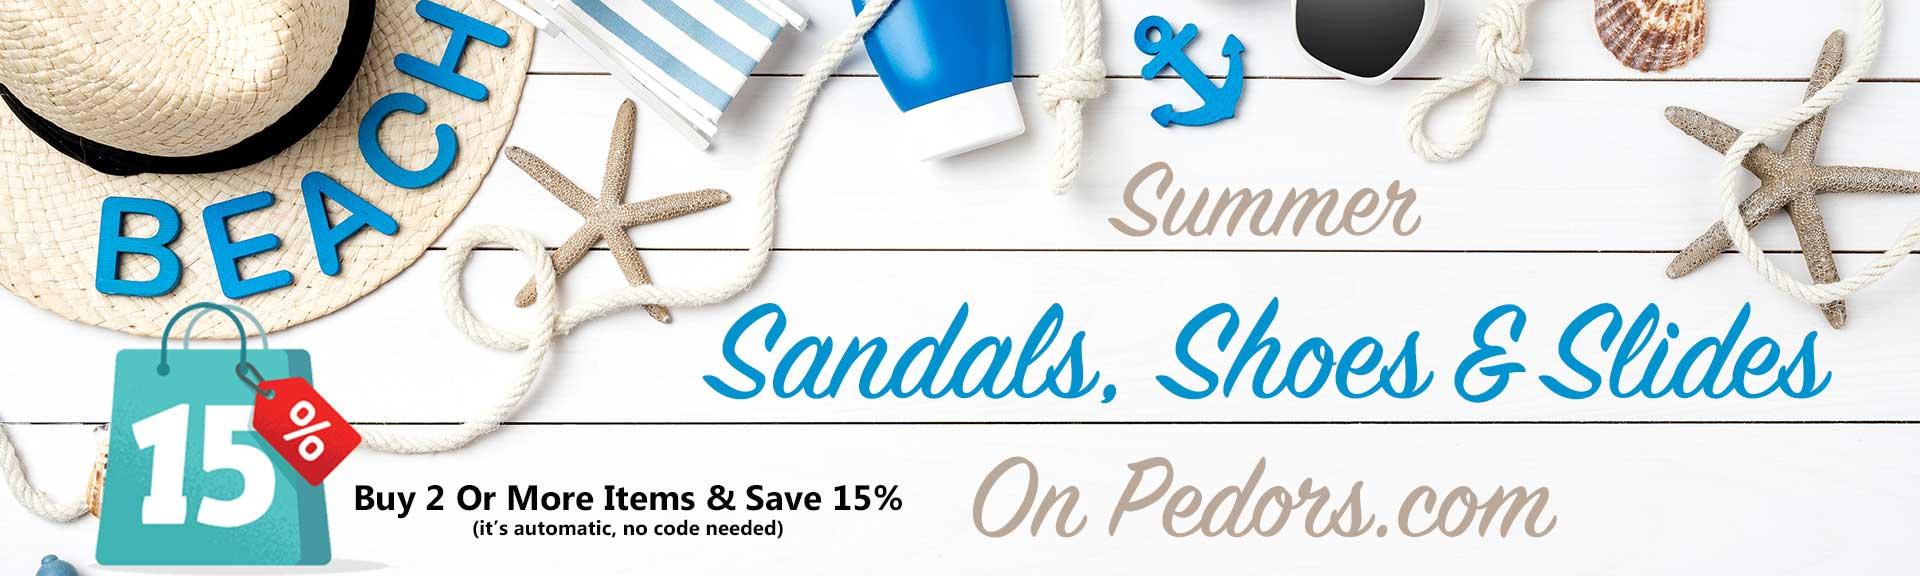 Summer Section on Pedors.com - Sandals, Shoes & Slides